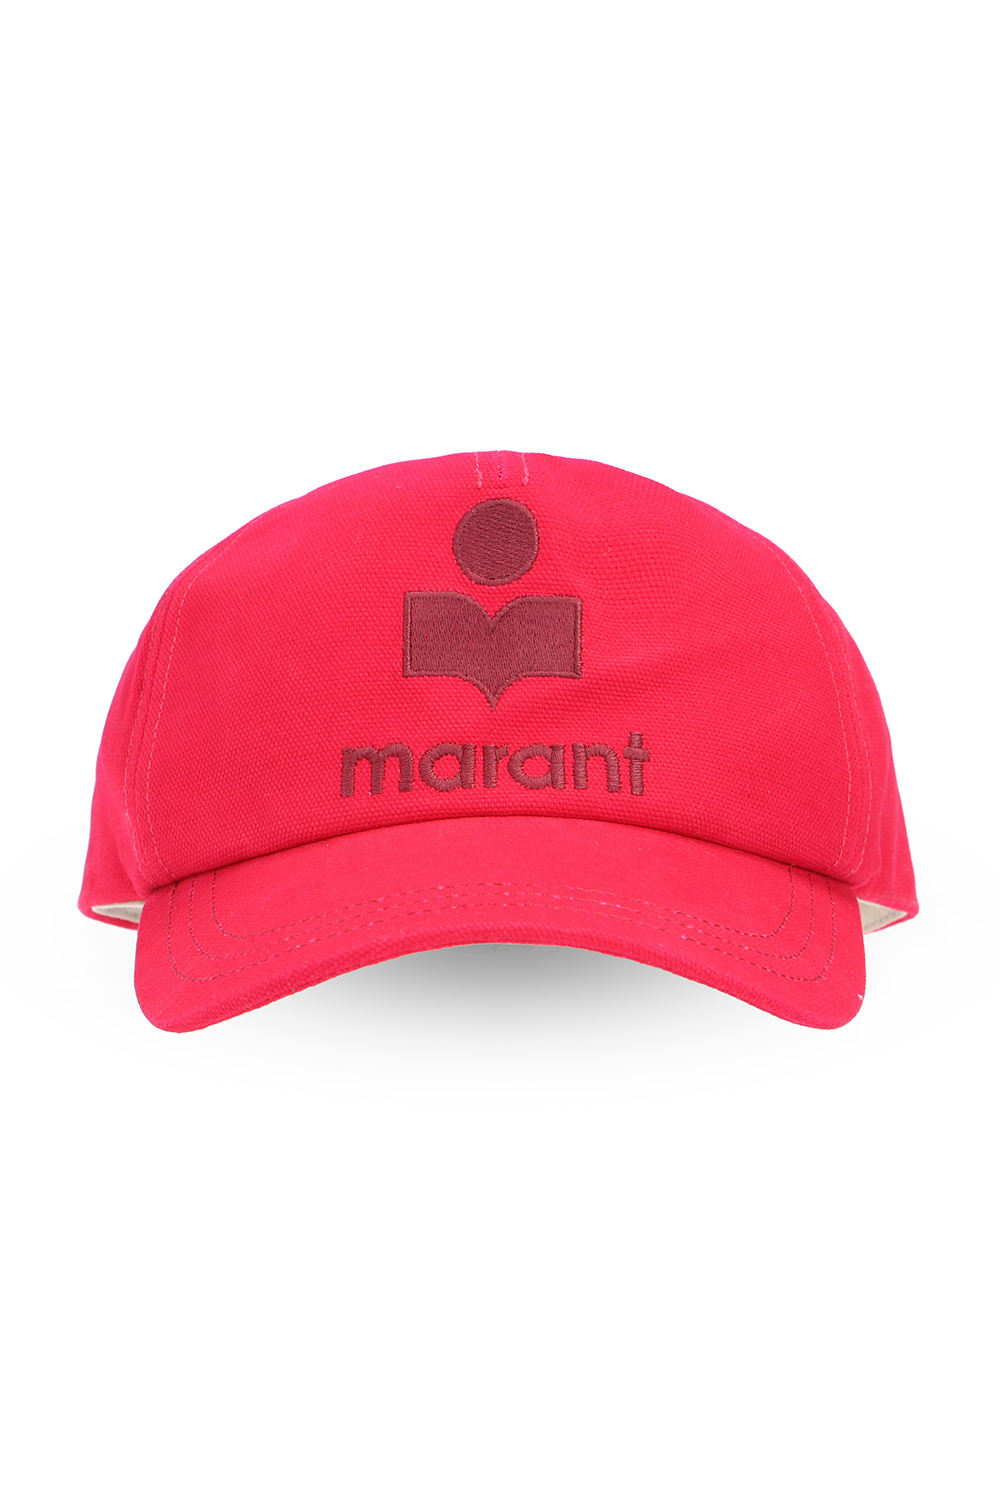 Isabel Marant Baseball cap with logo